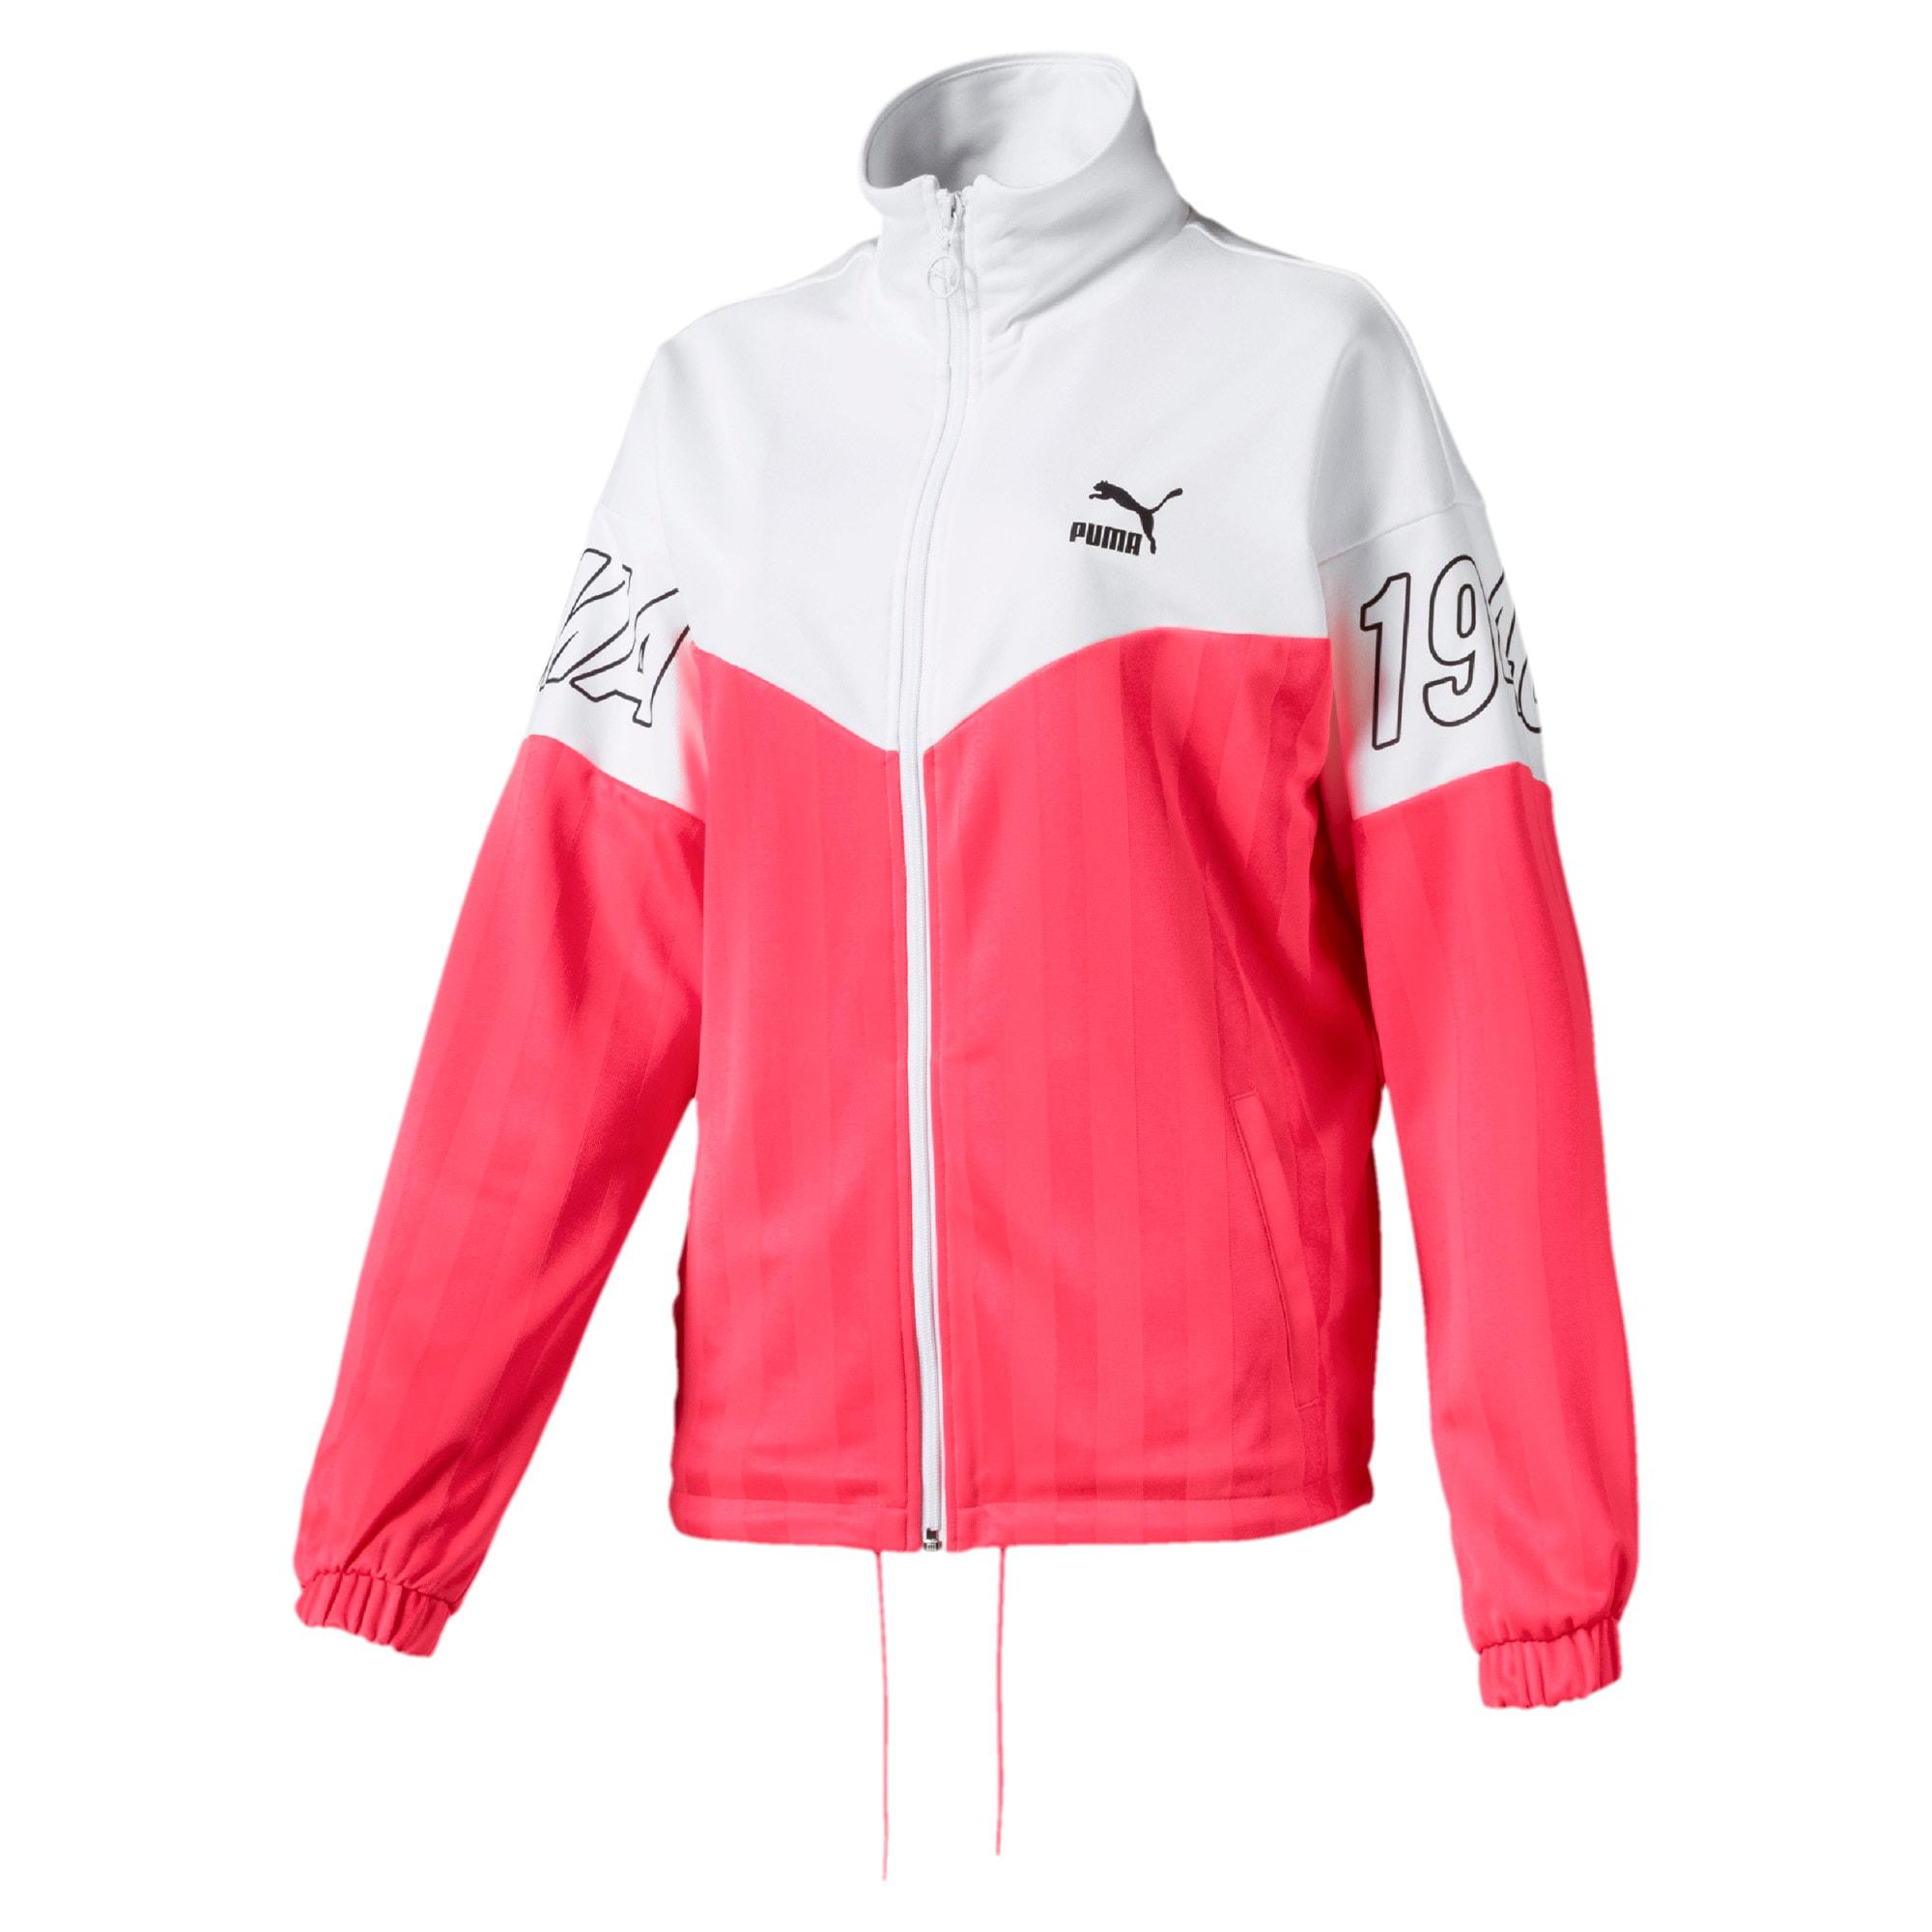 Thumbnail 1 of luXTG Jacquard Women's Track Jacket, Pink Alert, medium